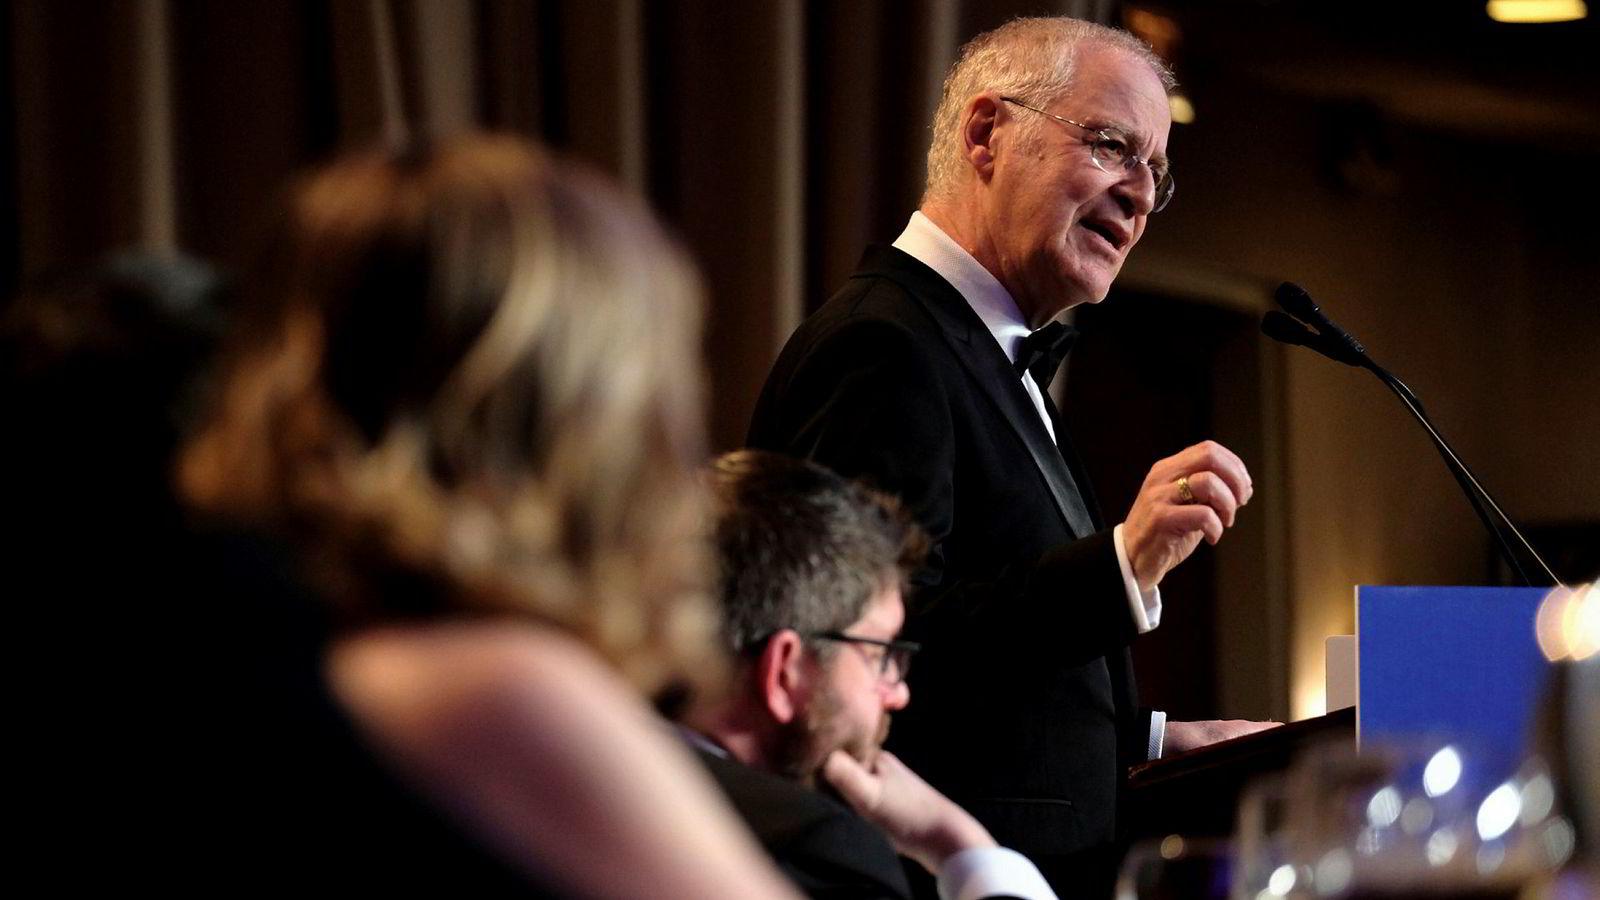 Forfatter og historiker Ron Chernow var hovedtaler under den årlige White House Correspondents Association Dinner i Washington lørdag kveld.